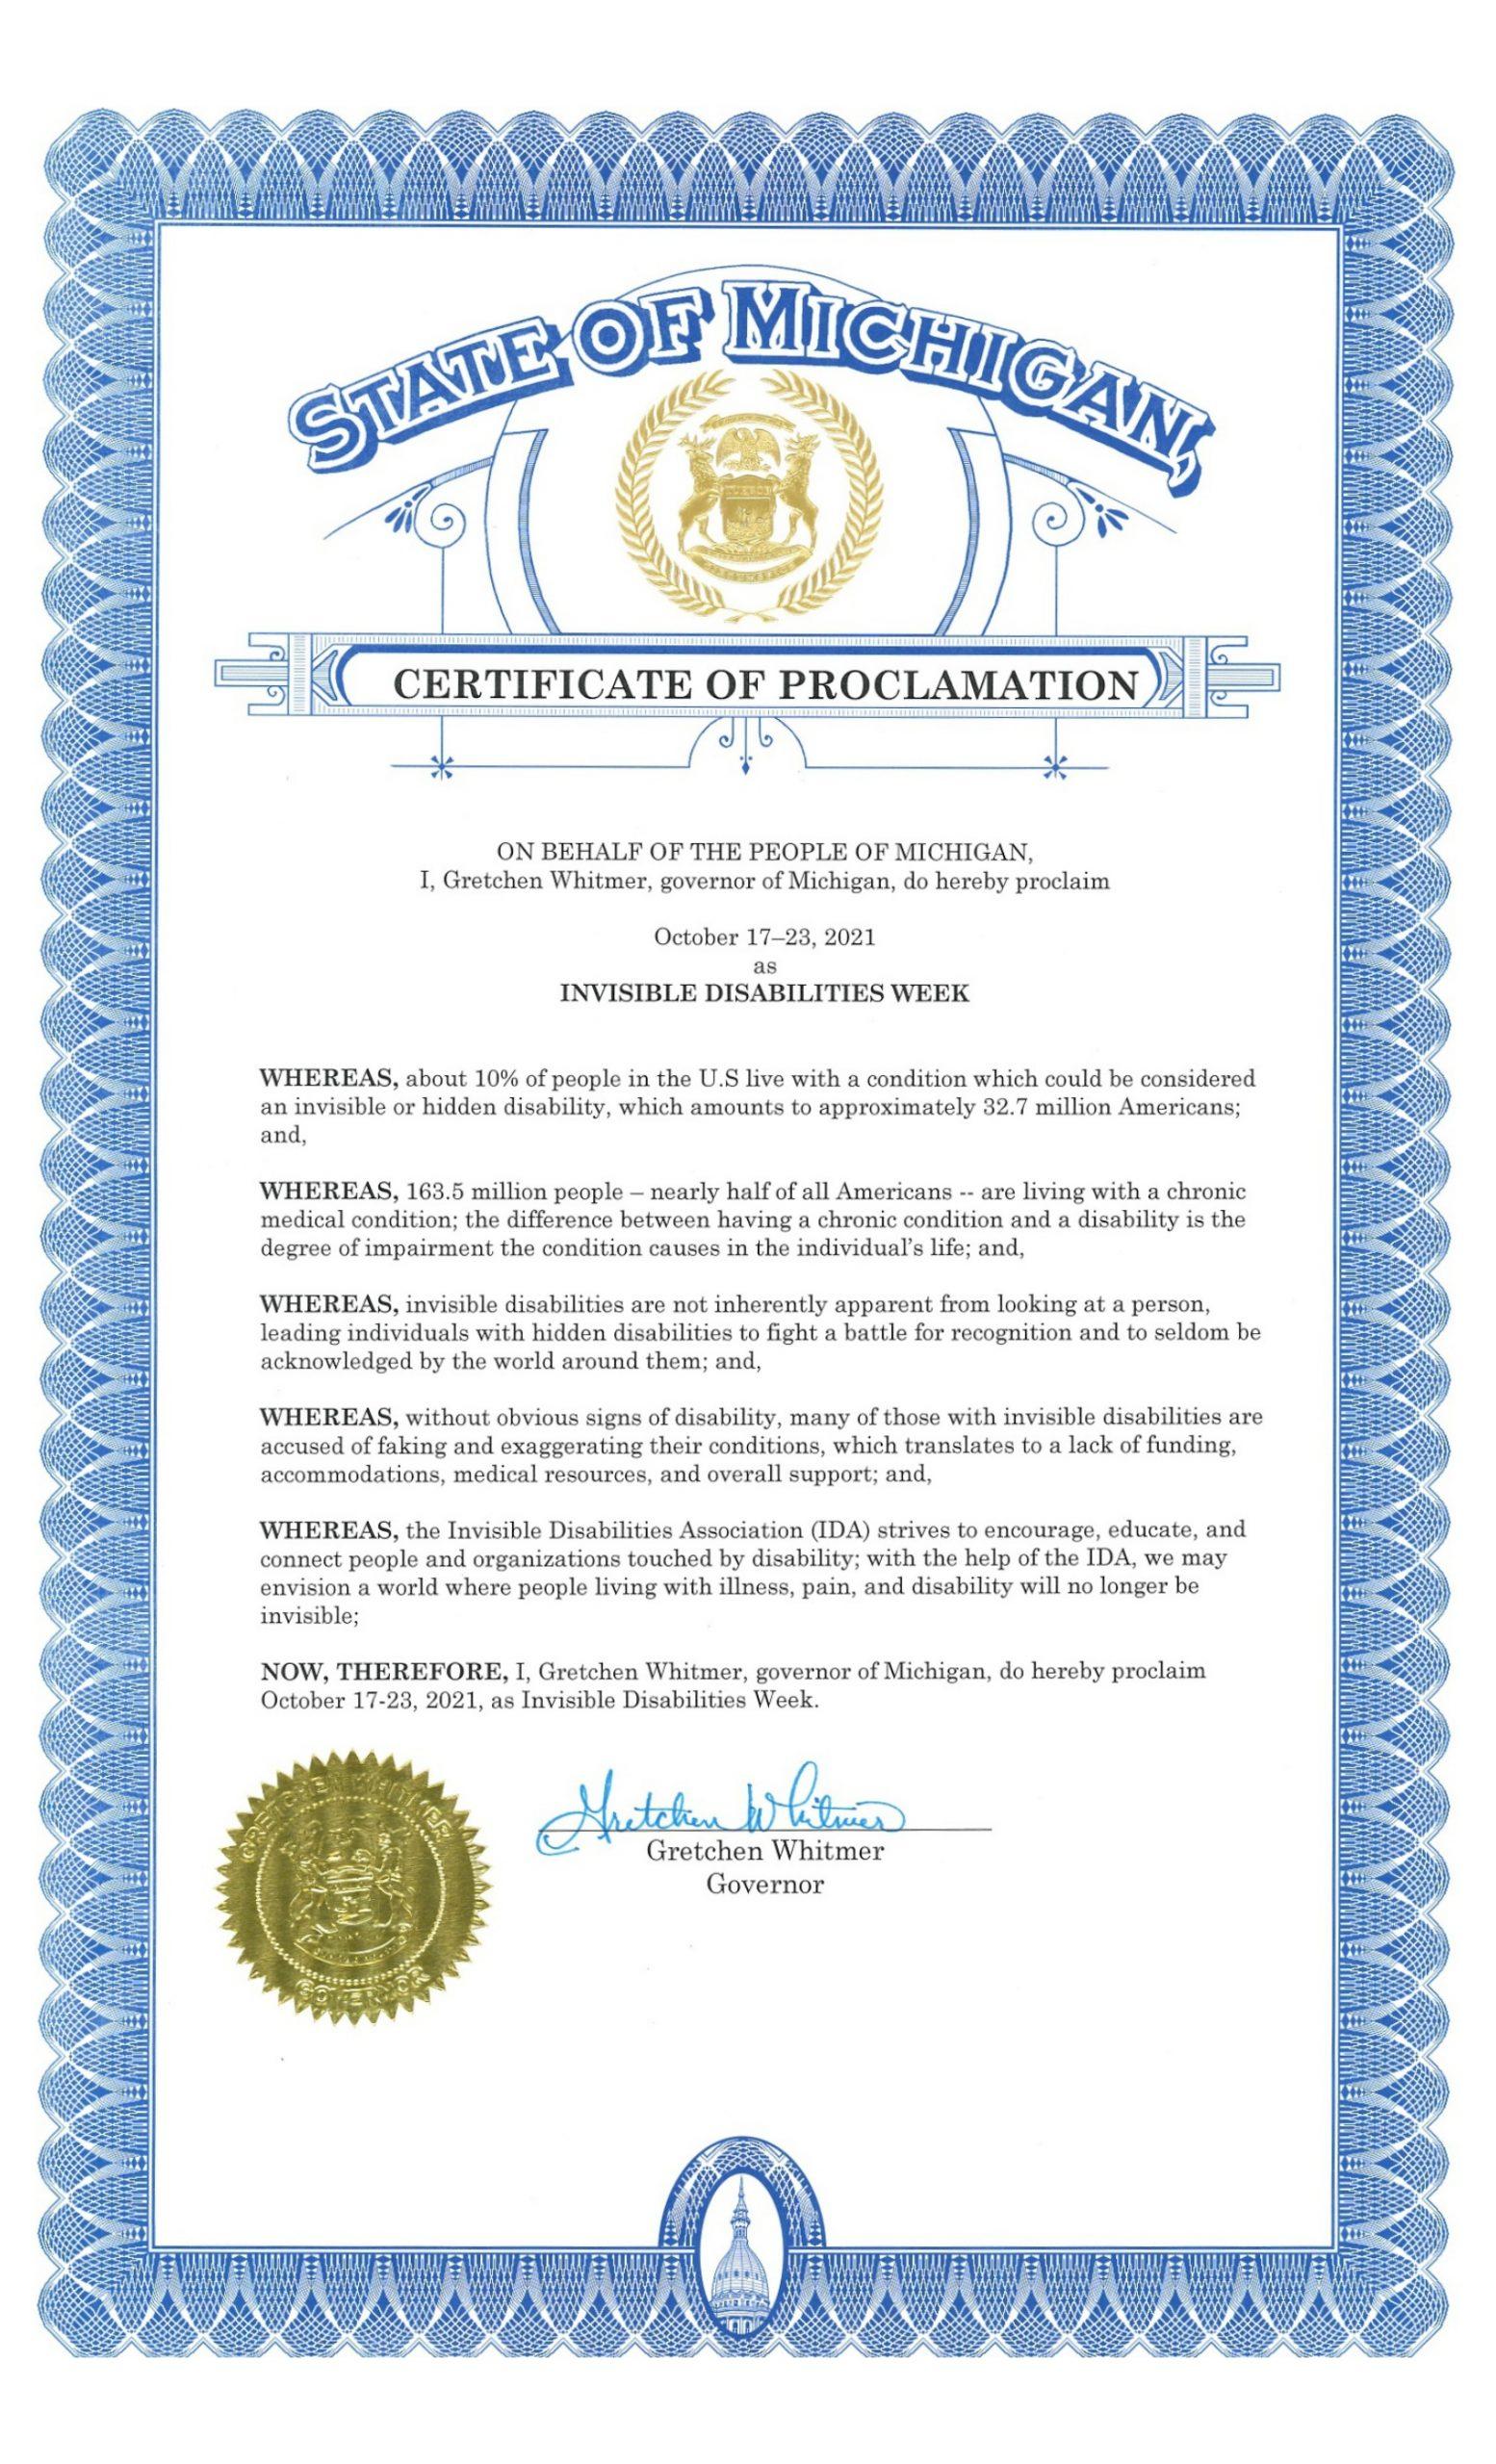 Michigan 2021 Invisible Disabilities Week Proclamation - Invisible Disabilities Association